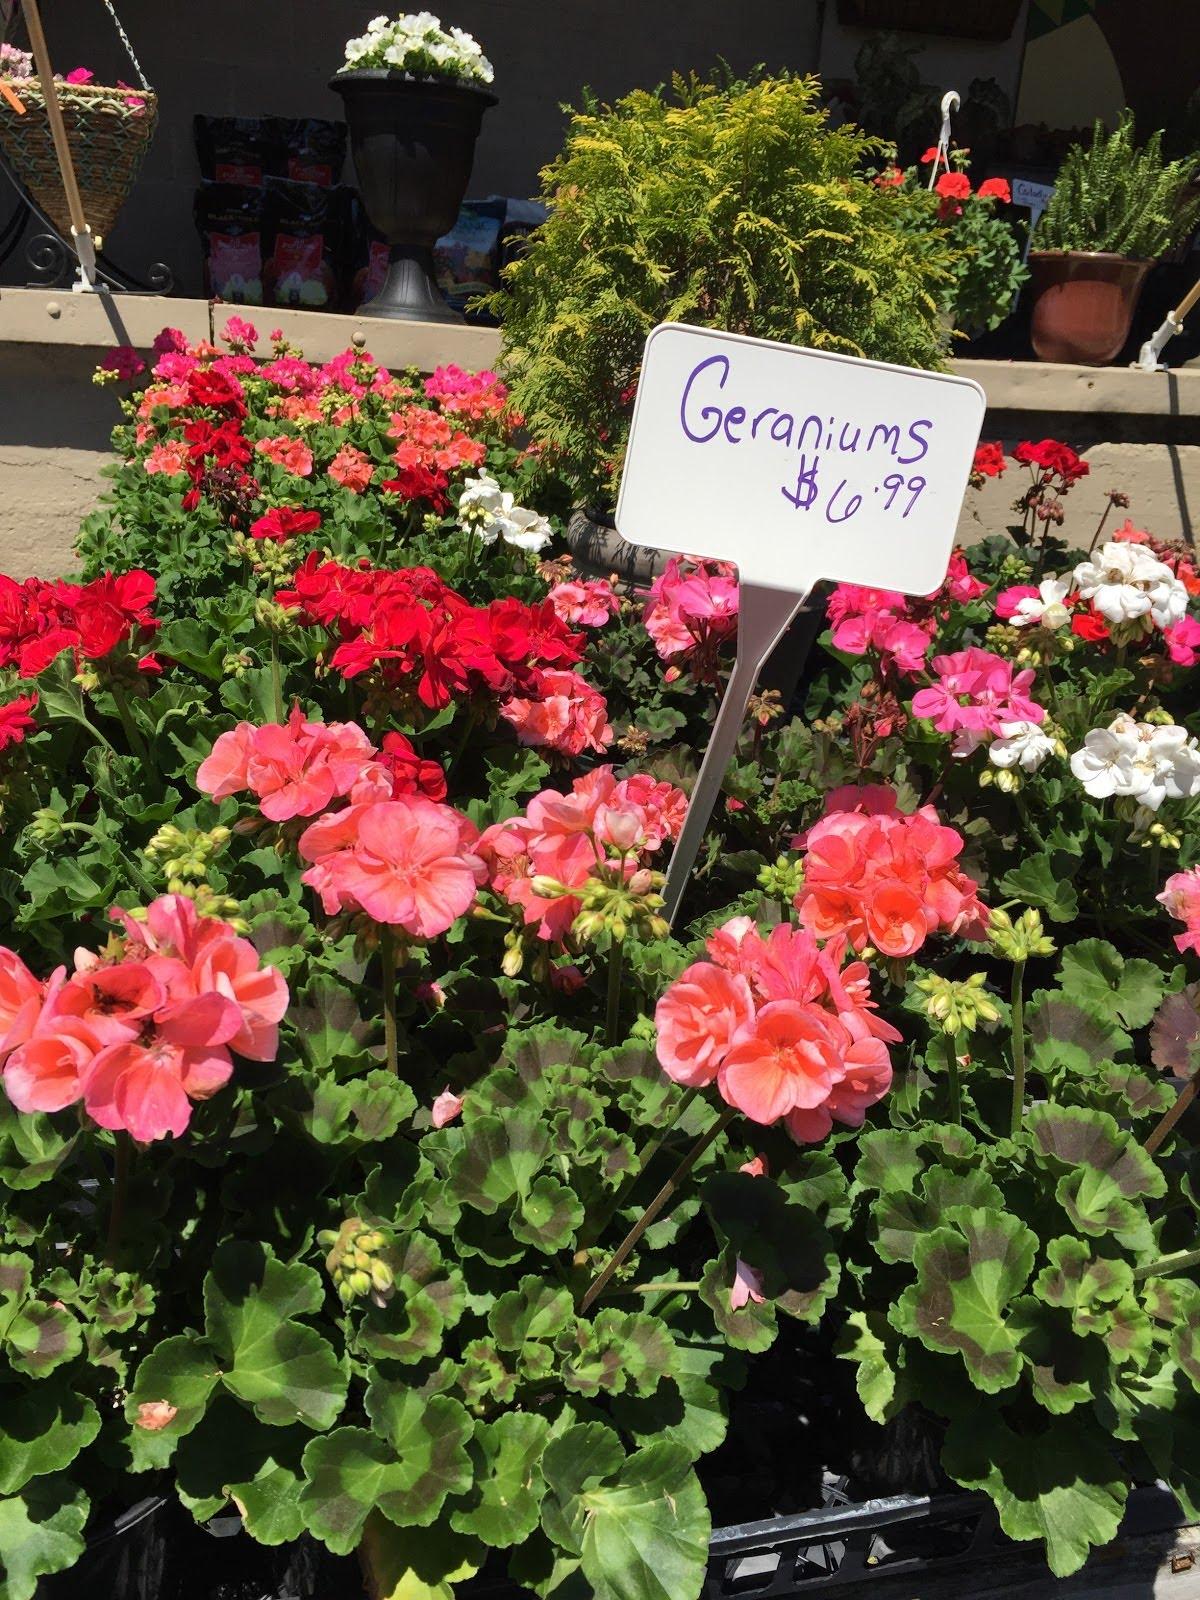 Geraniums-various colors.